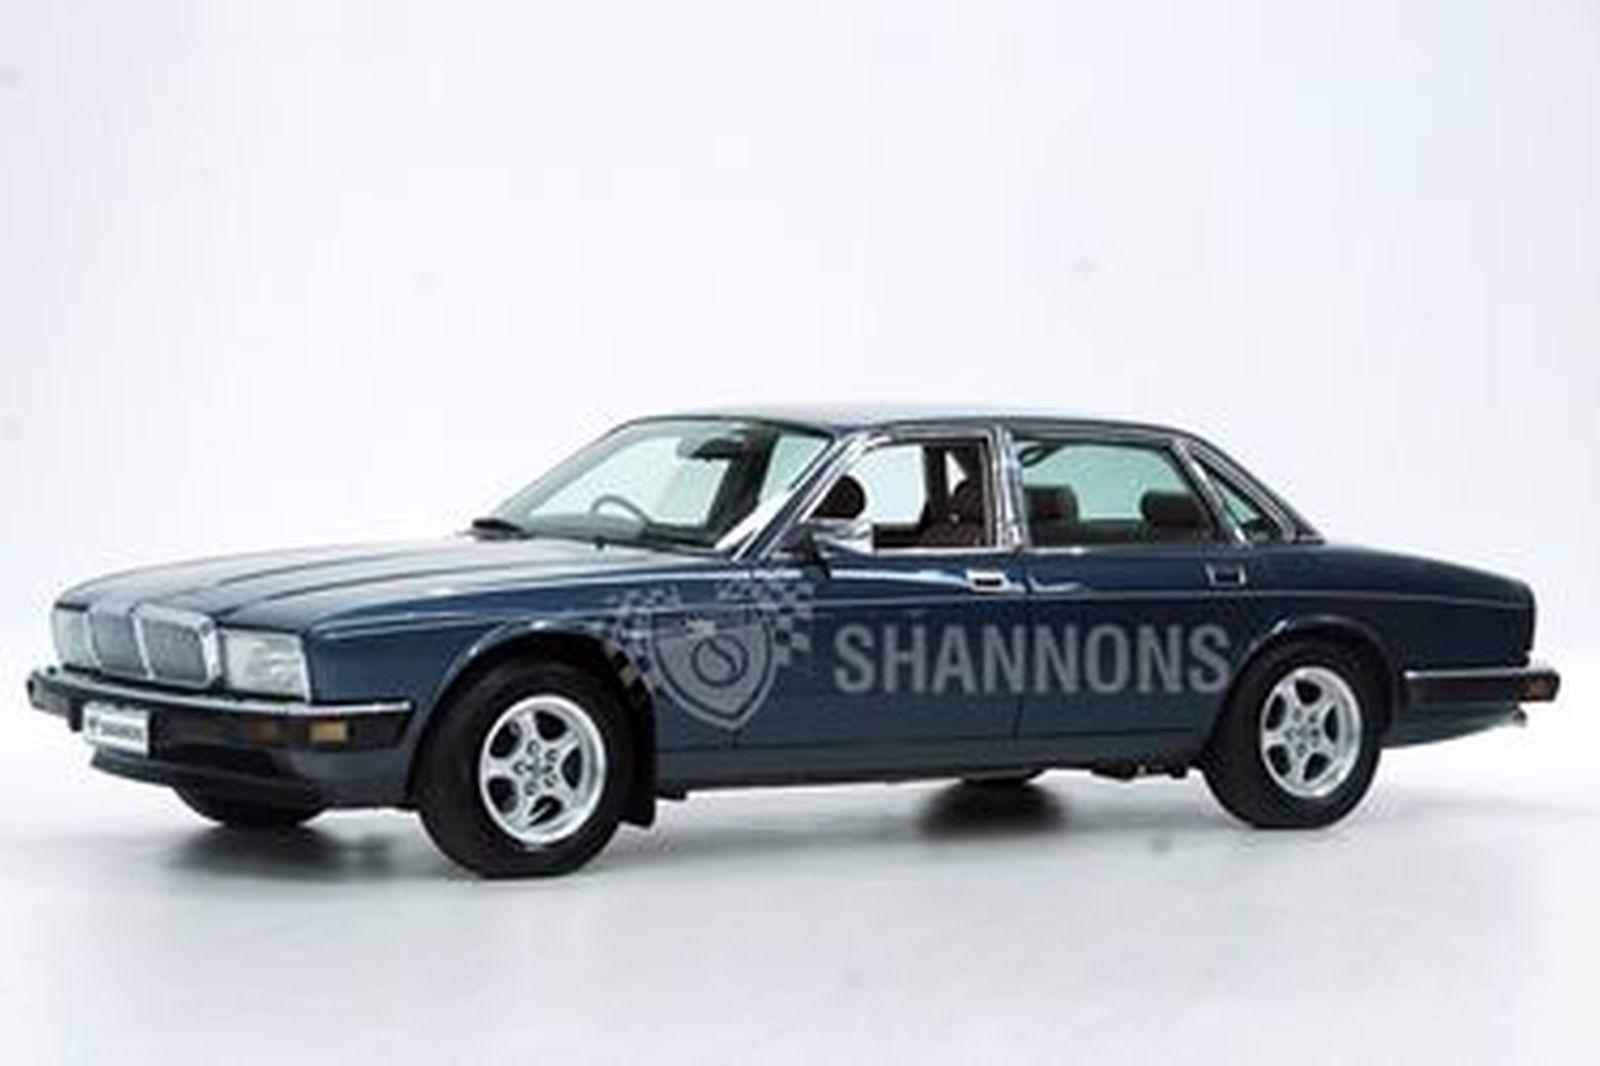 Jaguar XJ6 Sovereign 4.0 Saloon